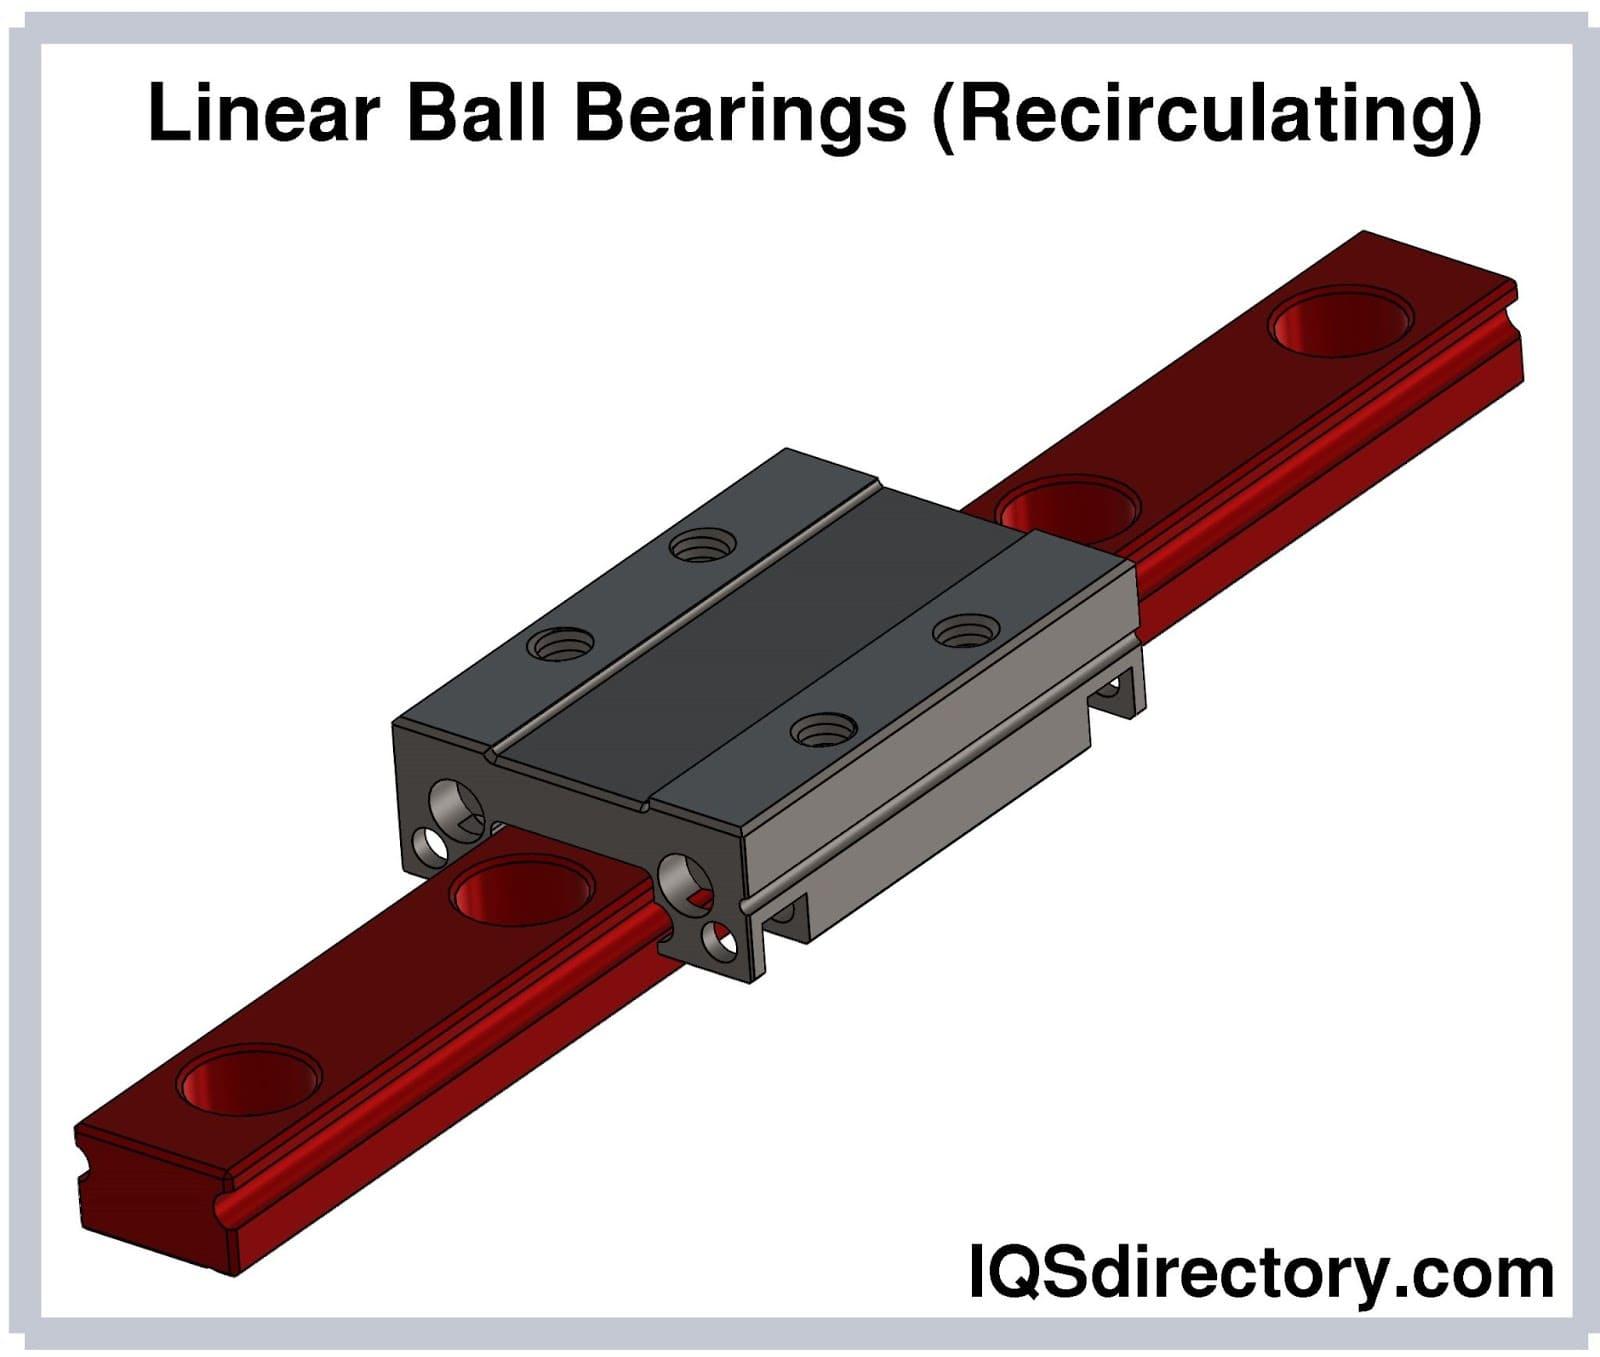 Linear Ball Bearings (Recirculating)